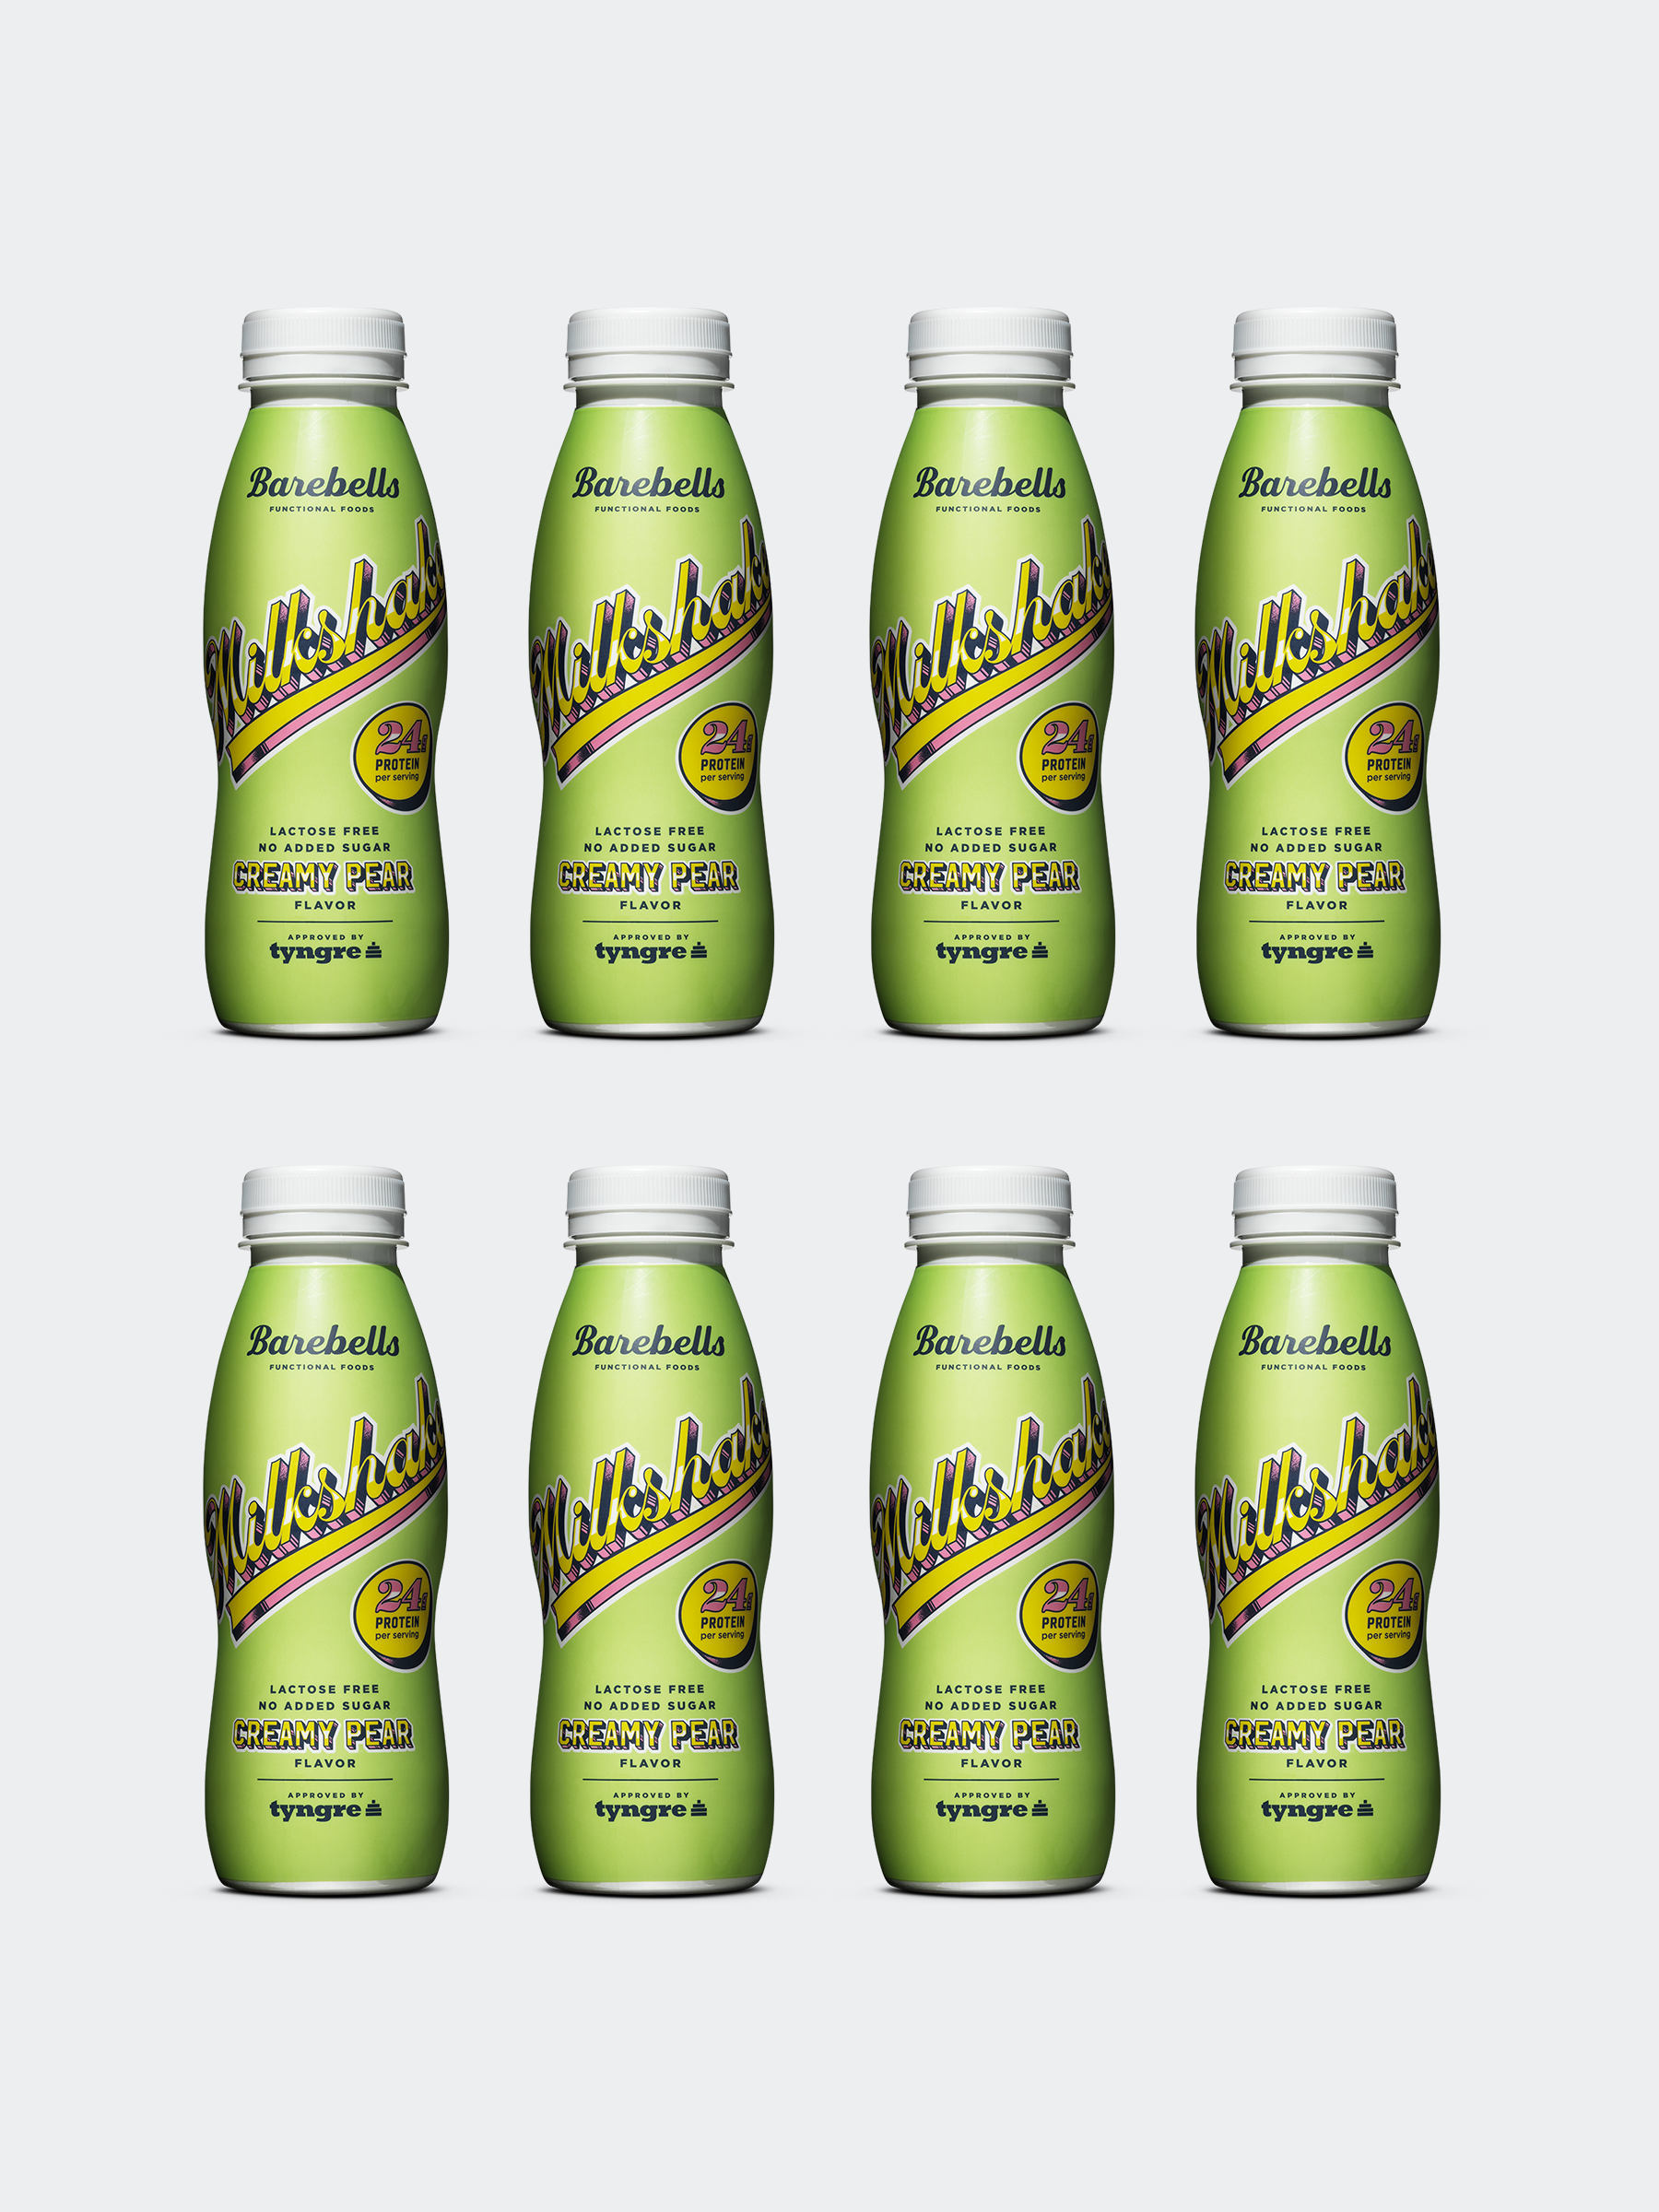 Barebells Milkshake Creamy Pear 8-pack